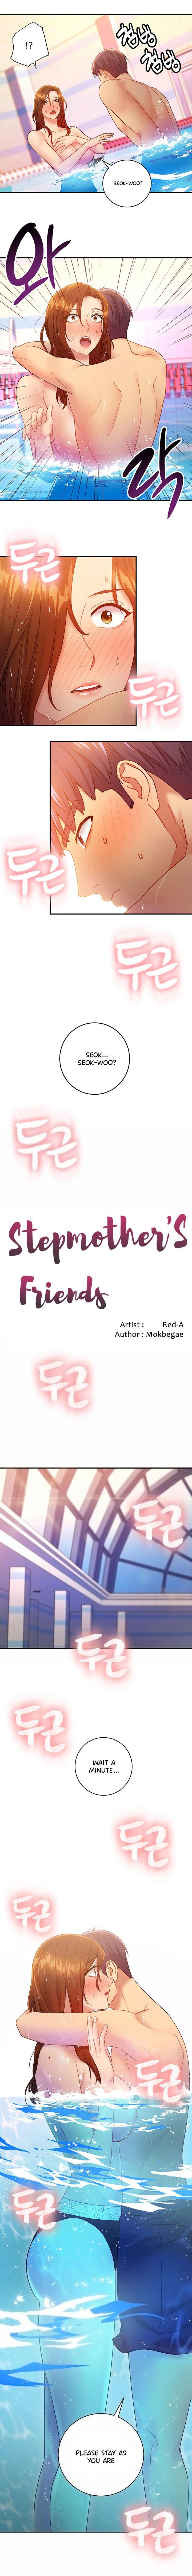 [Neck Pilllow] Stepmother Friends Ch.40/? [English] [Hentai Universe] NEW! 22/10/2020 317